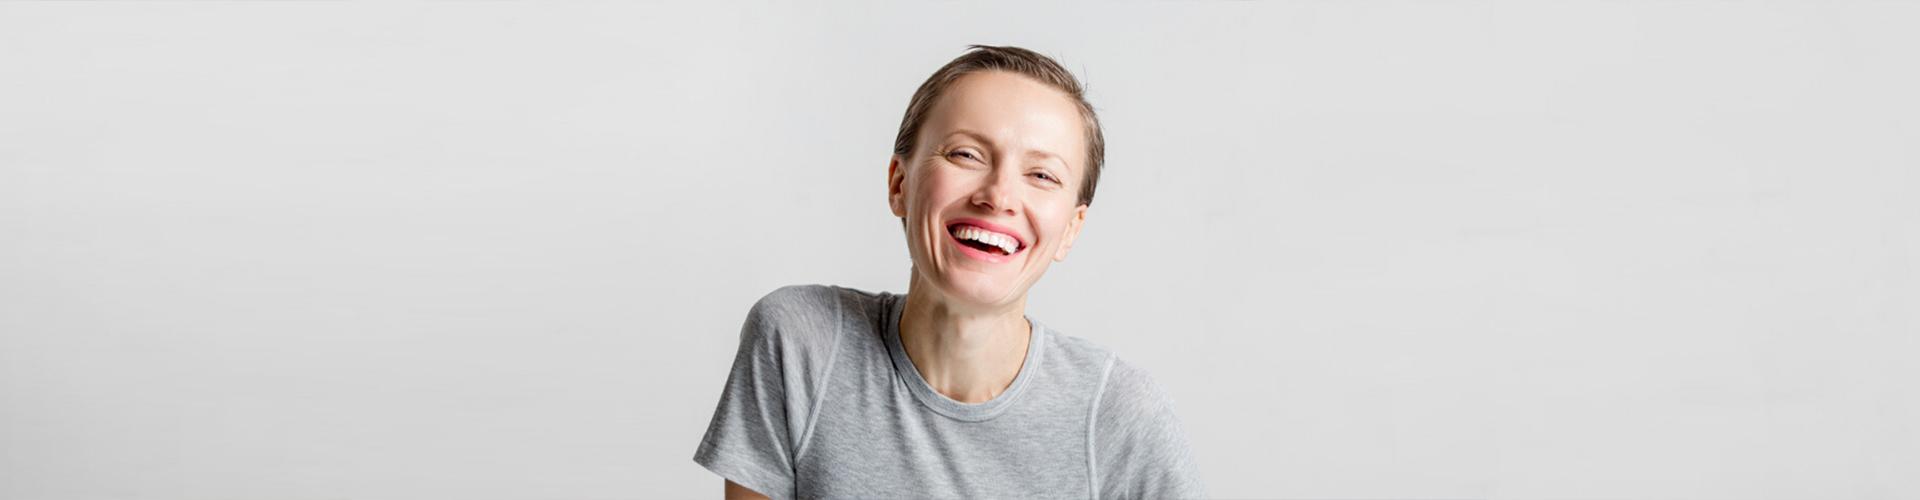 Dental Hygiene and Periodontics